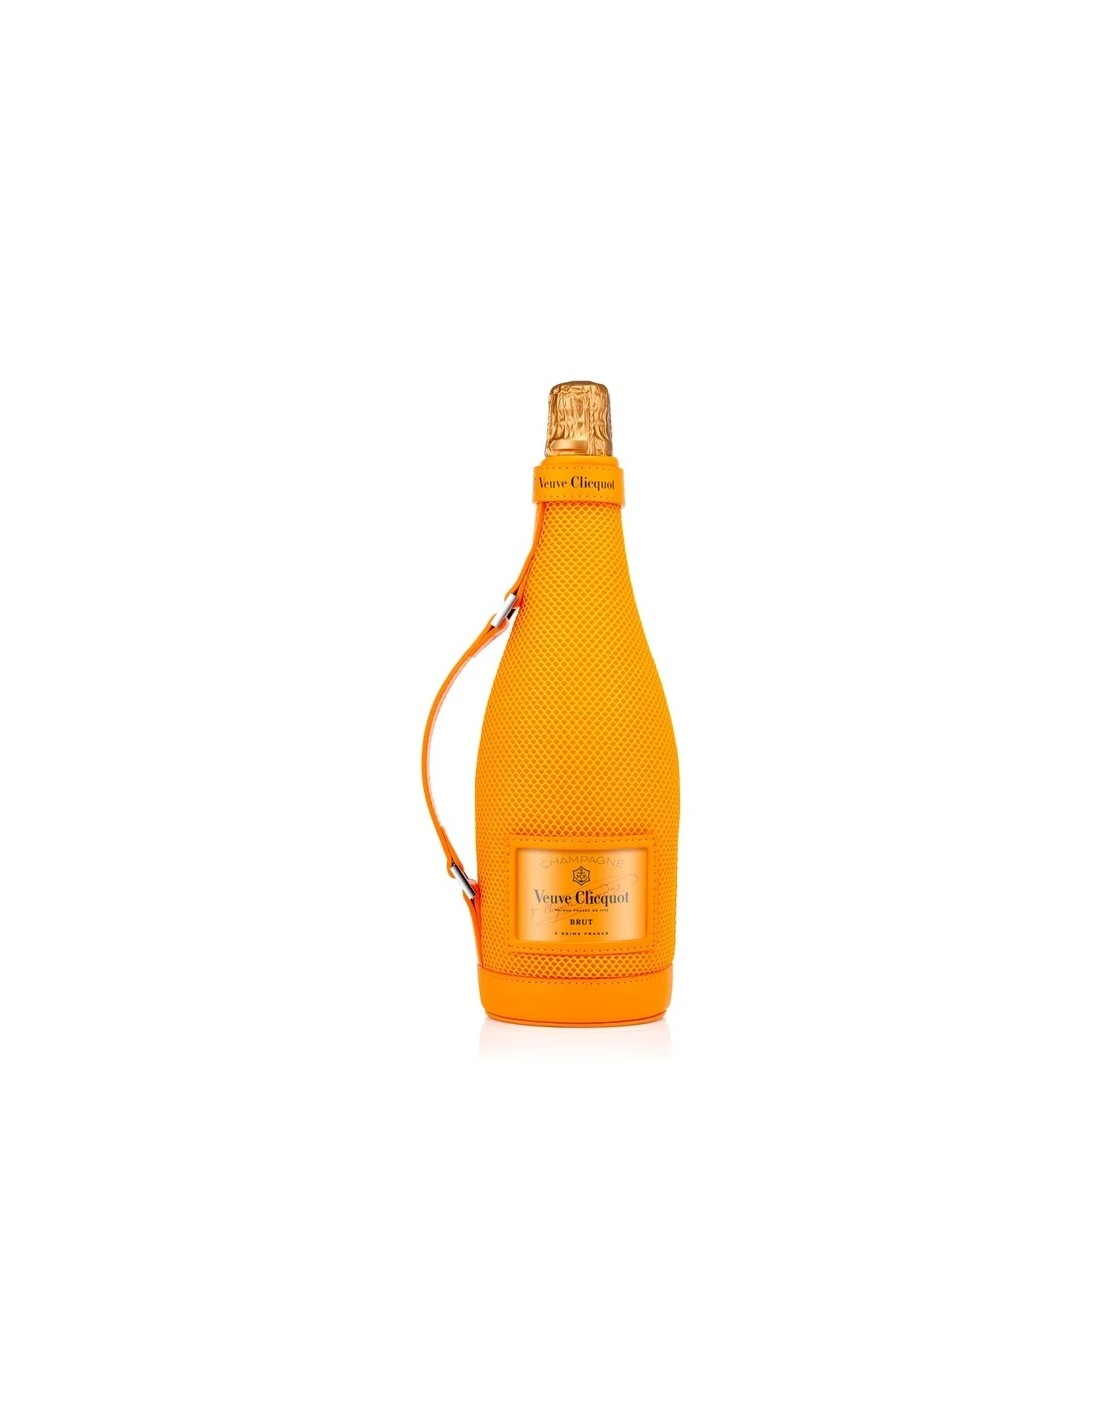 Sampanie, Veuve Clicquot Ice Jacket Champagne, 0.75L, 12% alc., Franta